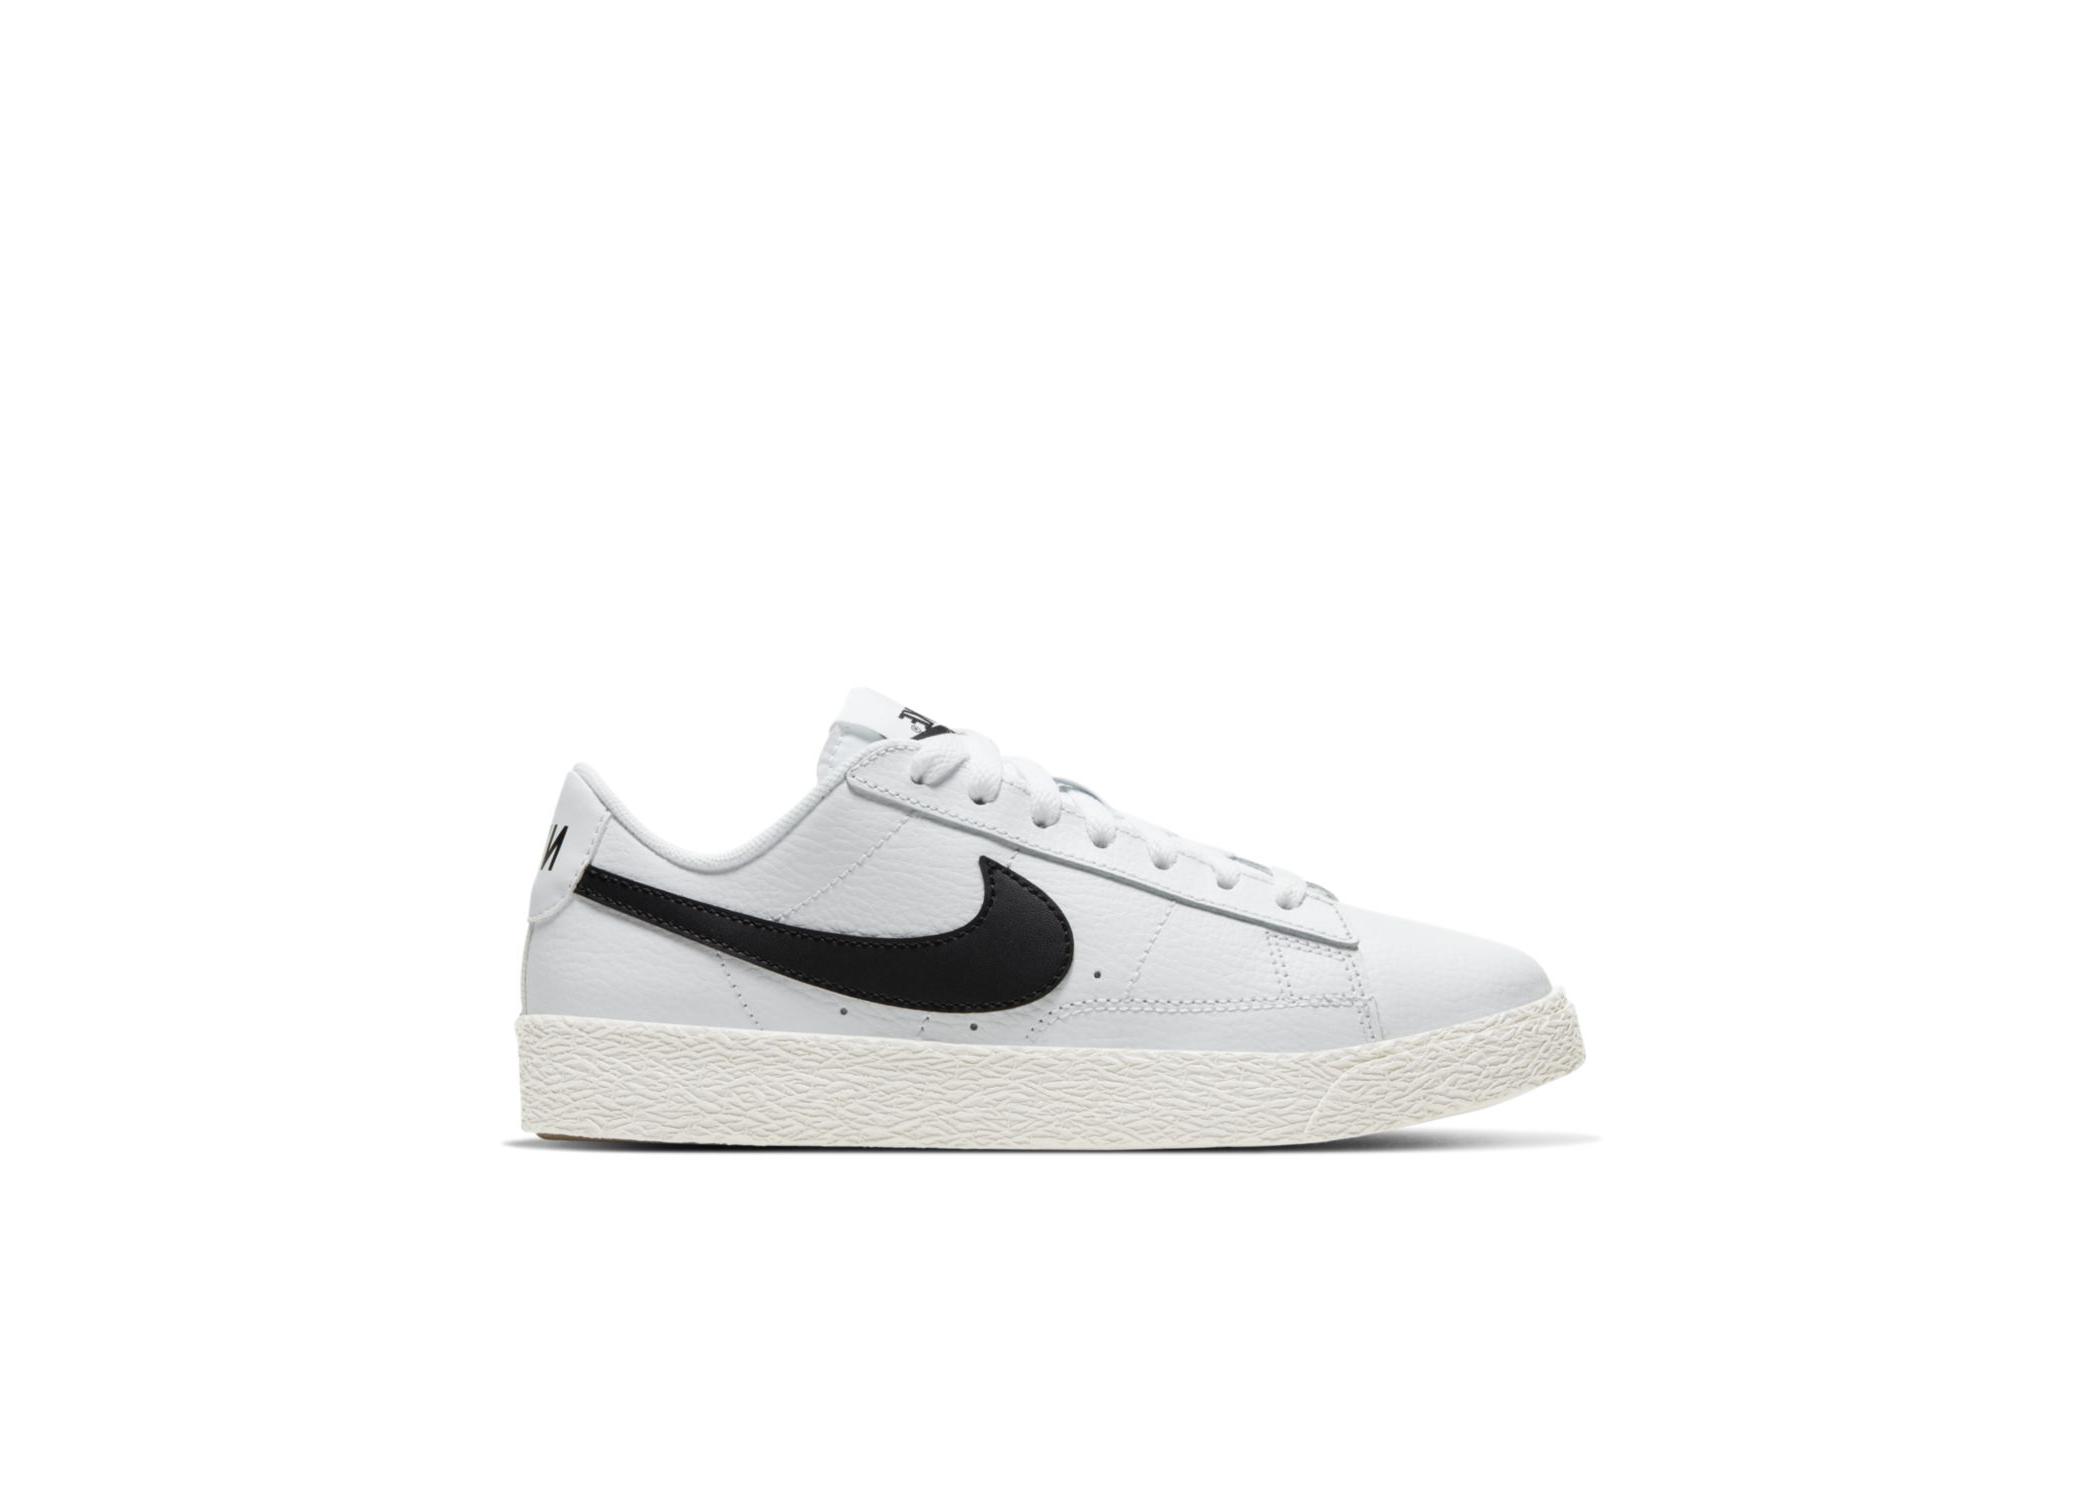 Nike Blazer Low White Black (GS) - CZ7106-101